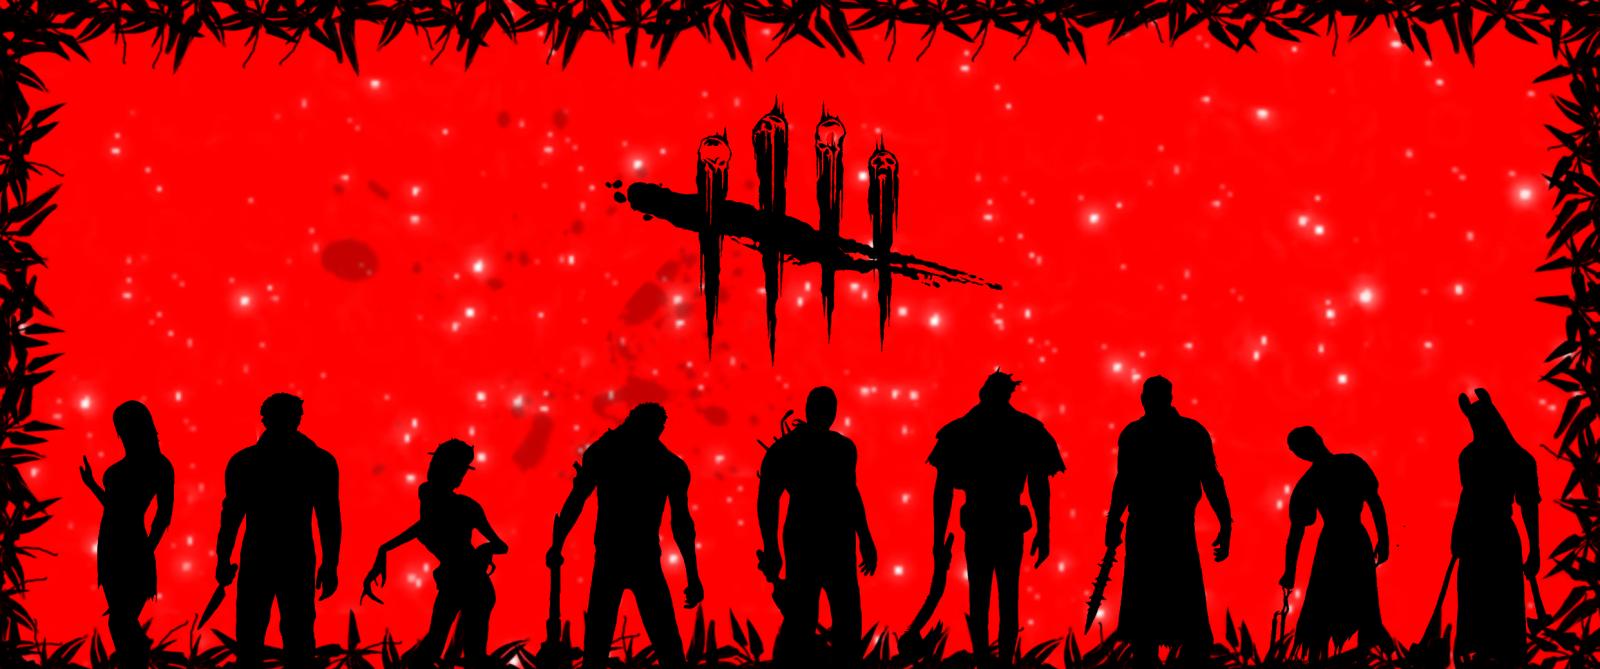 Wallpaper : Dead by Daylight 2484x1040 - SymbioteCoyote ...